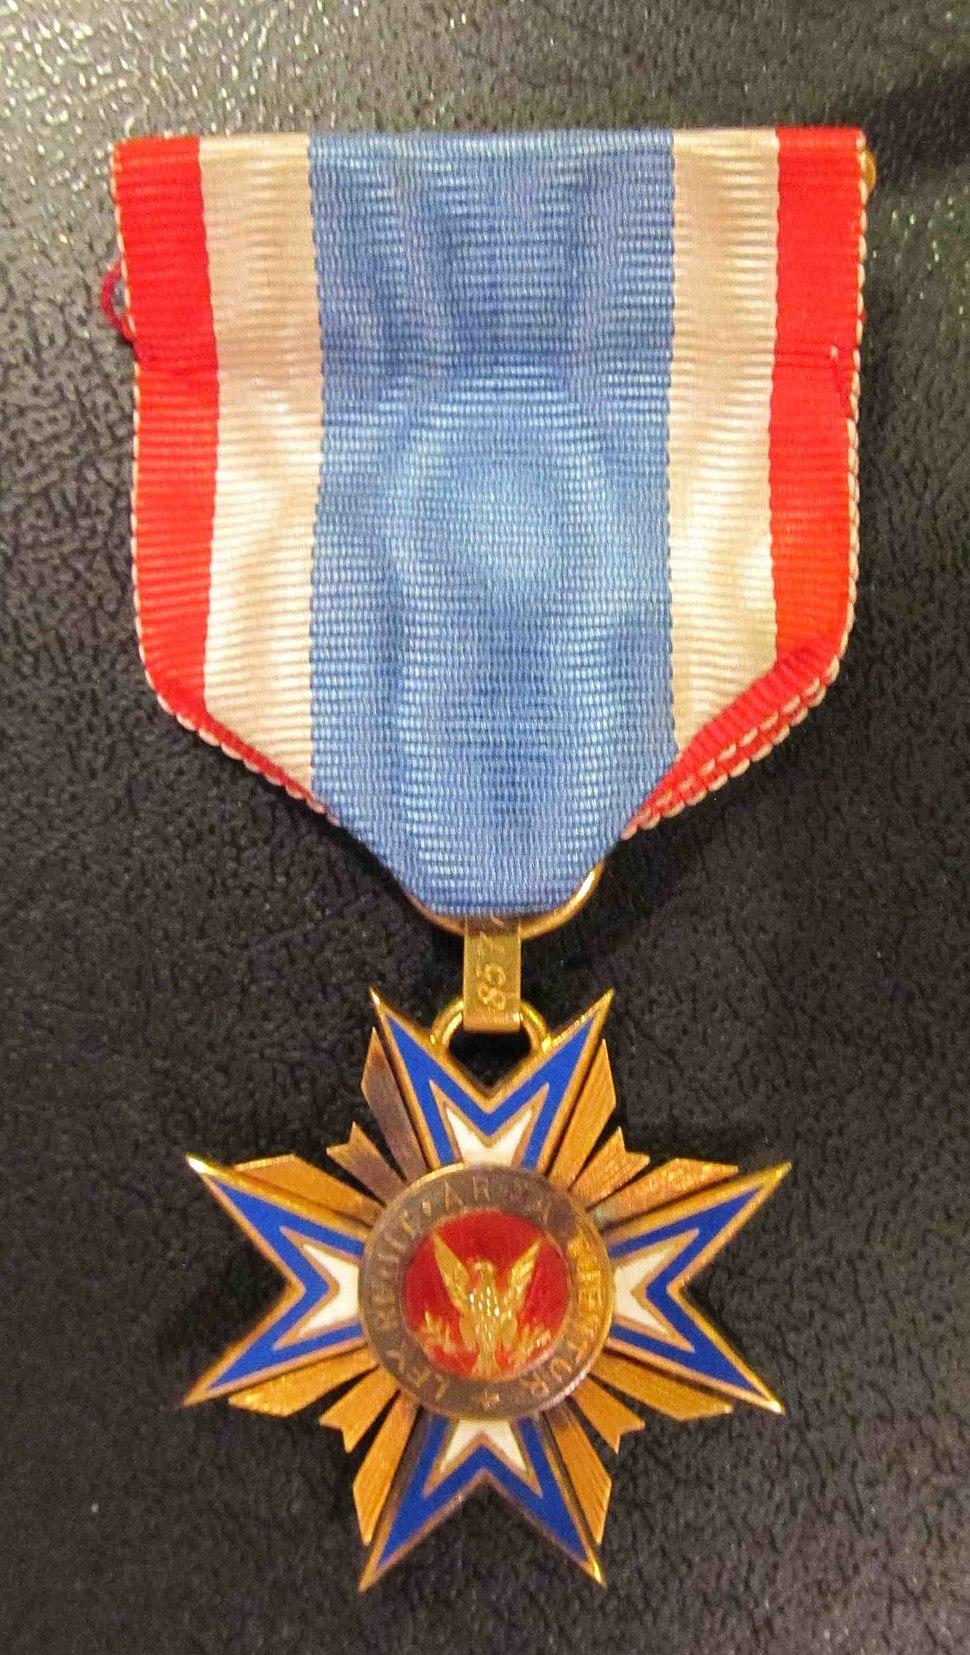 MOLLUS membership medal